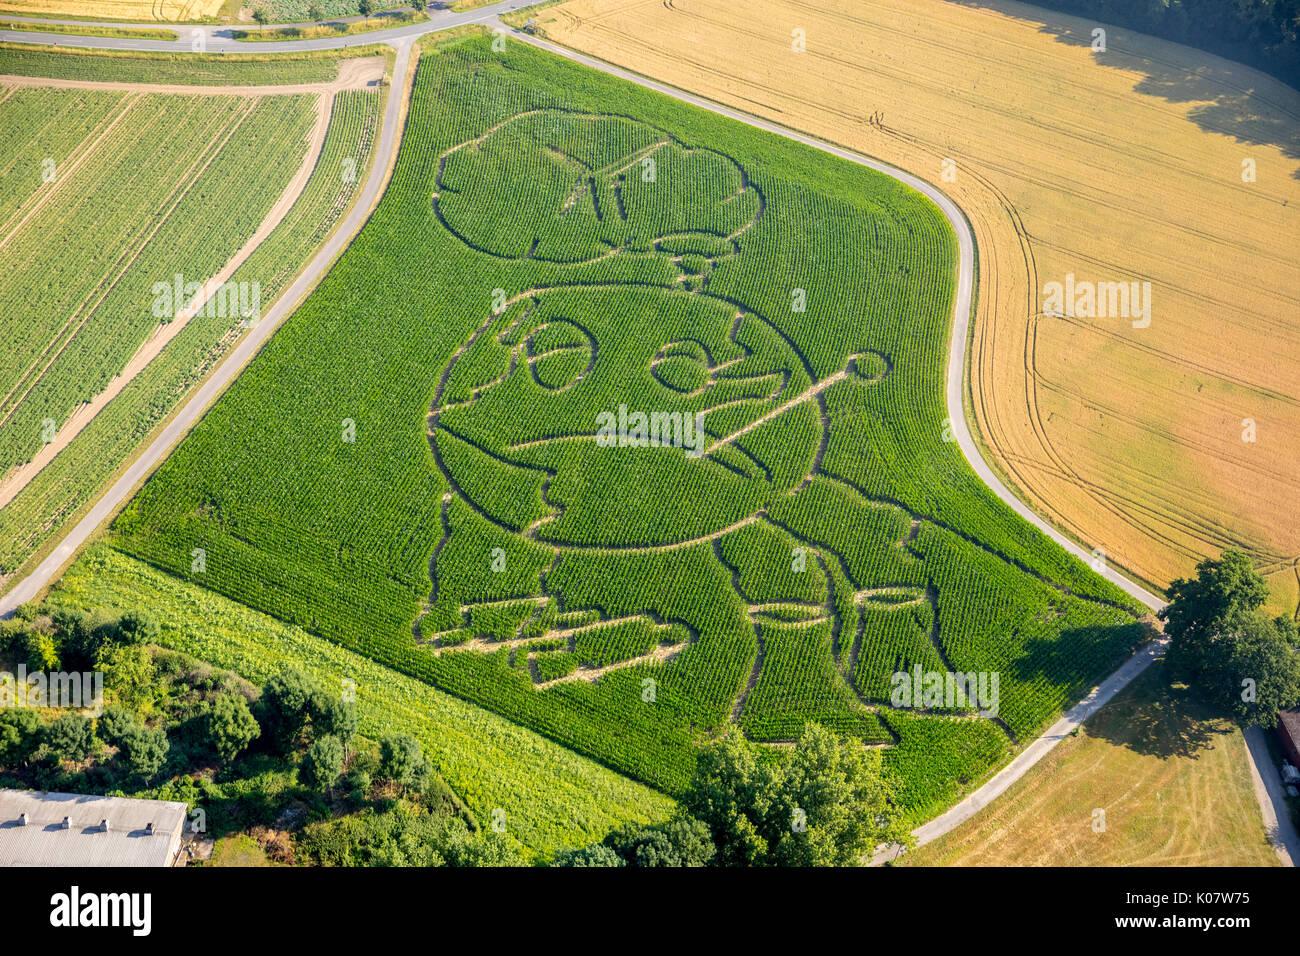 Corn maze, global warming, Selm, Ruhr area, North Rhine-Westphalia, Germany Stock Photo